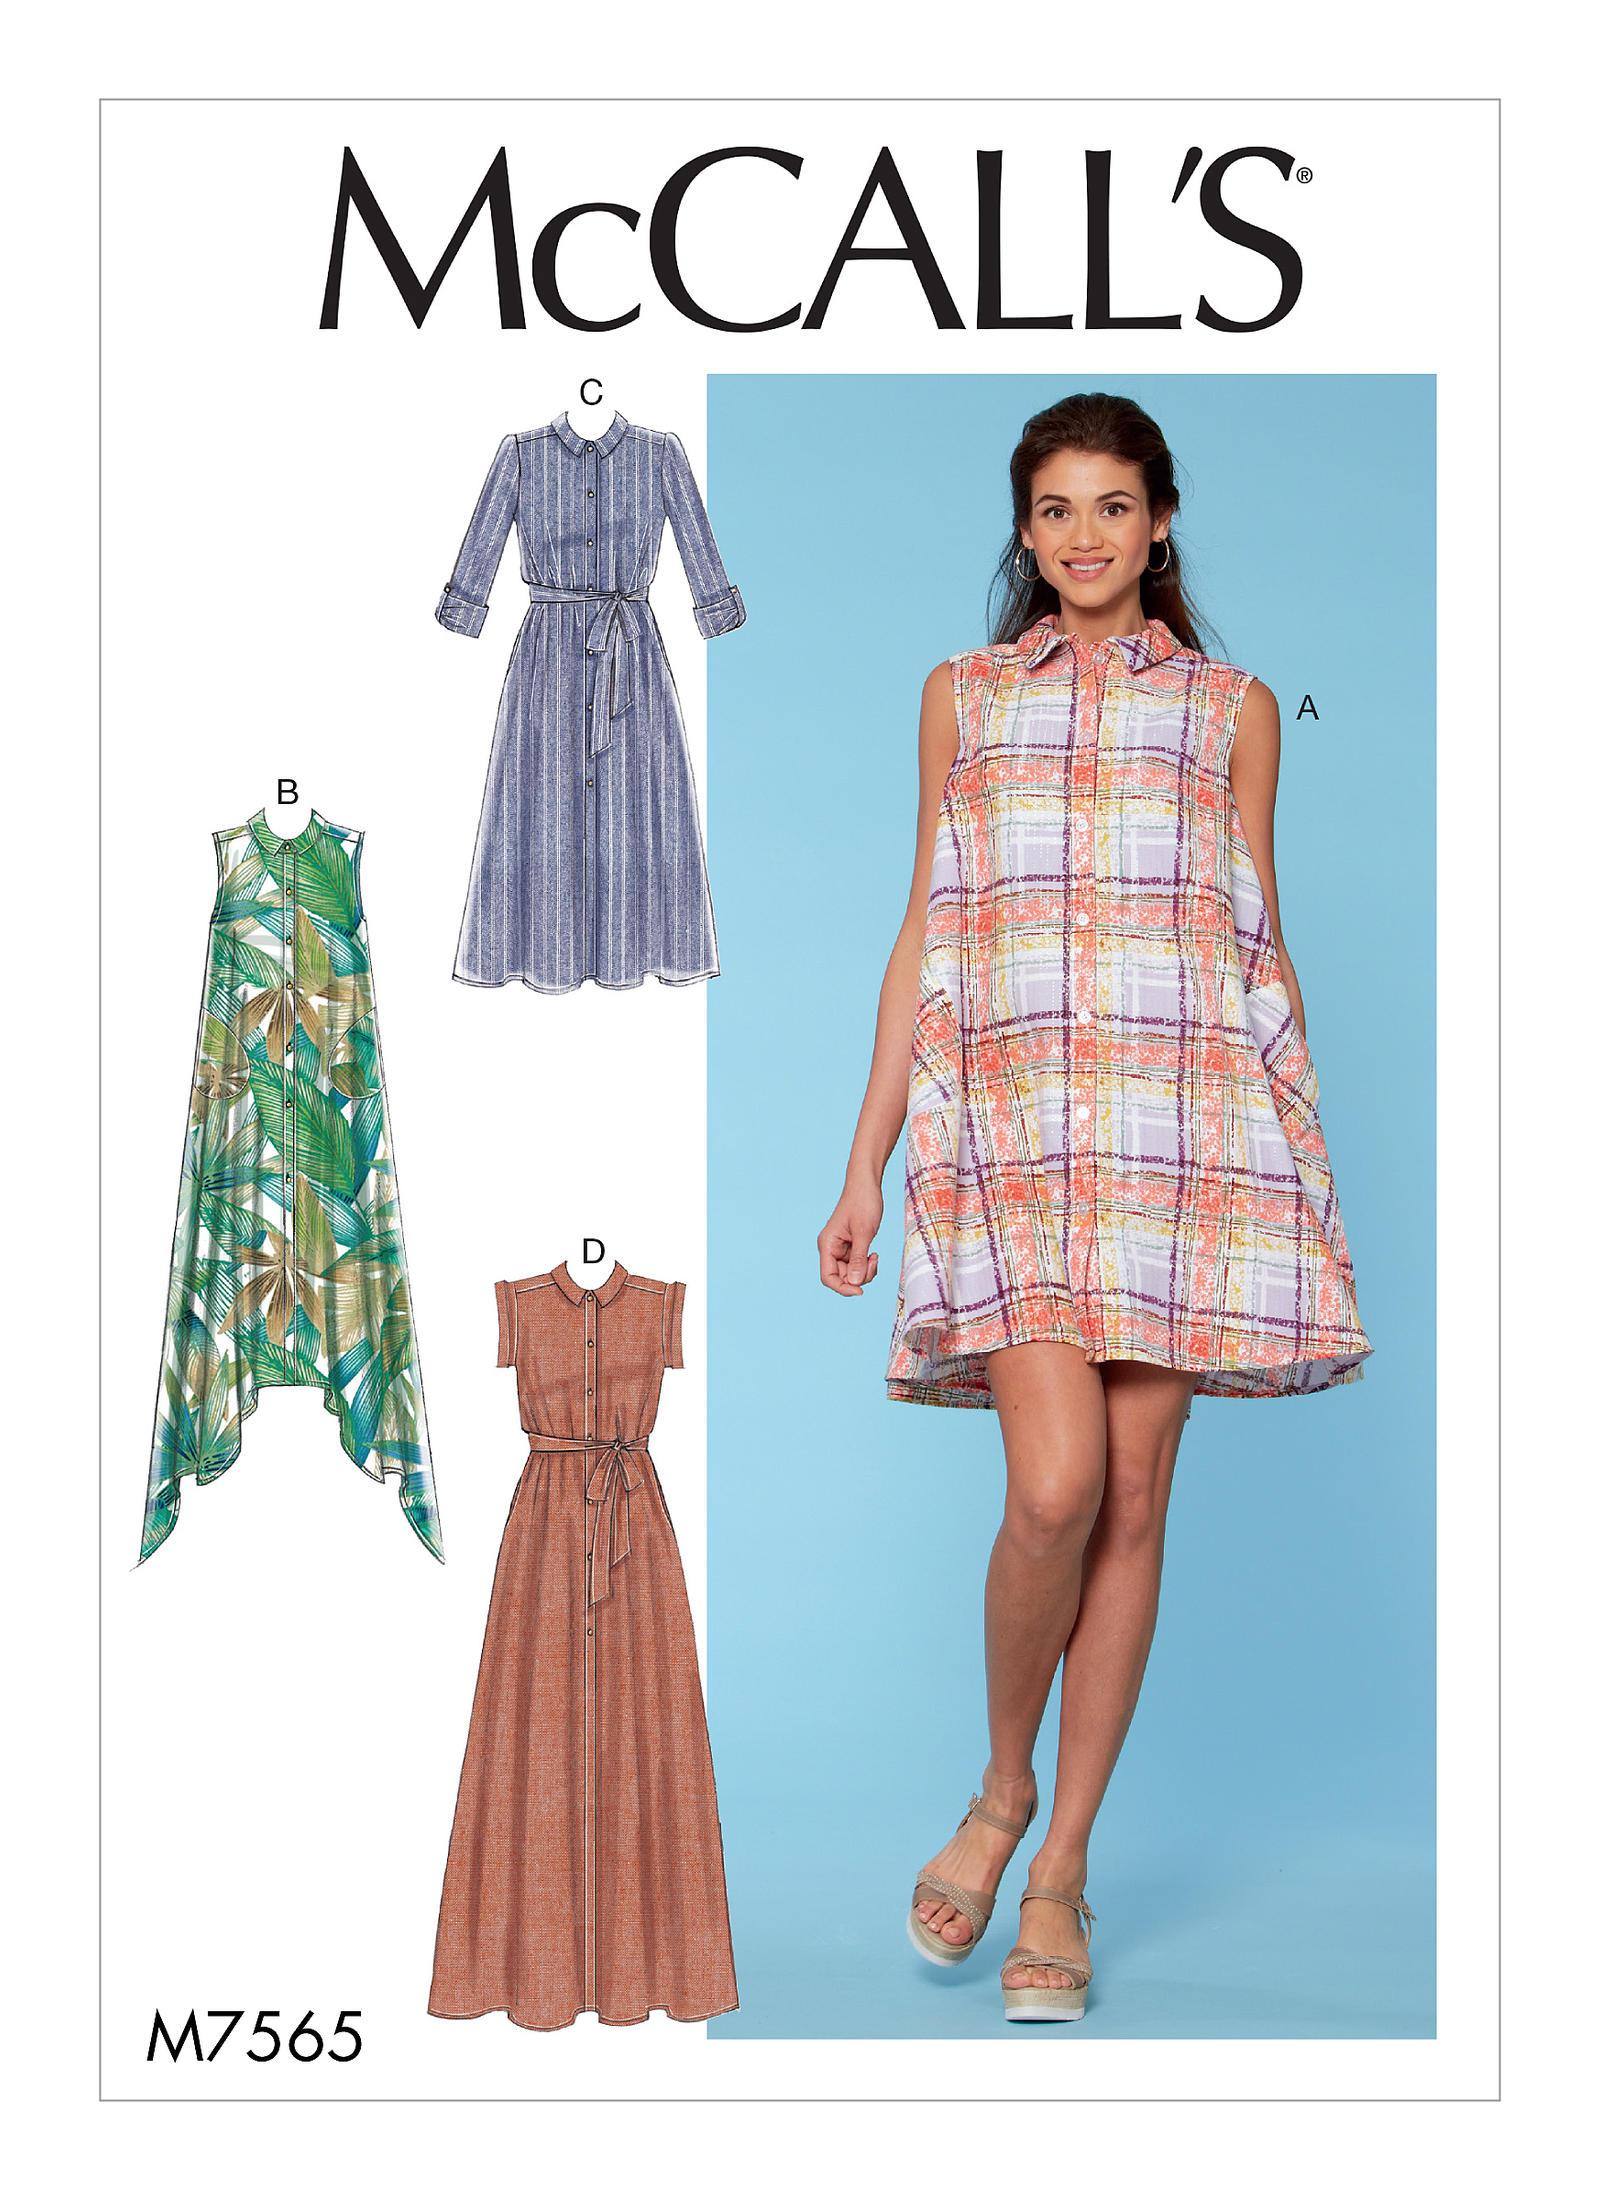 Colorblocked shirt dresses for misses